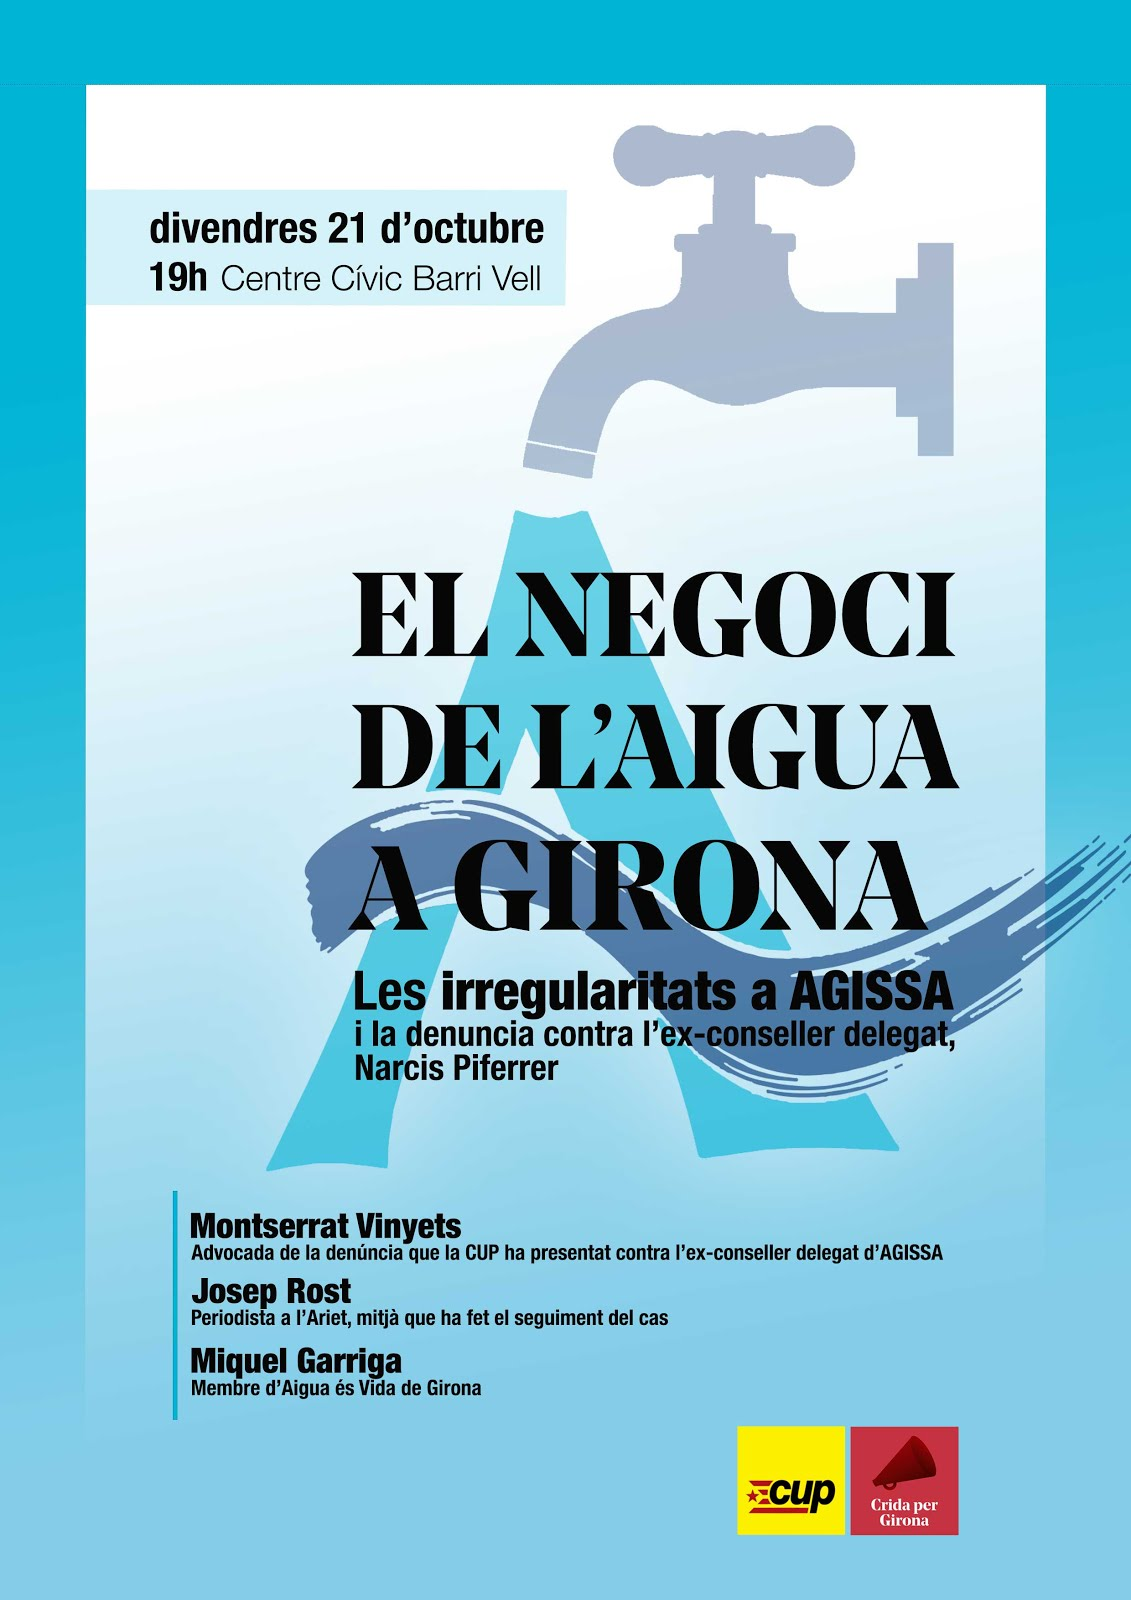 Xerrada 'El negoci de l'aigua a Girona'